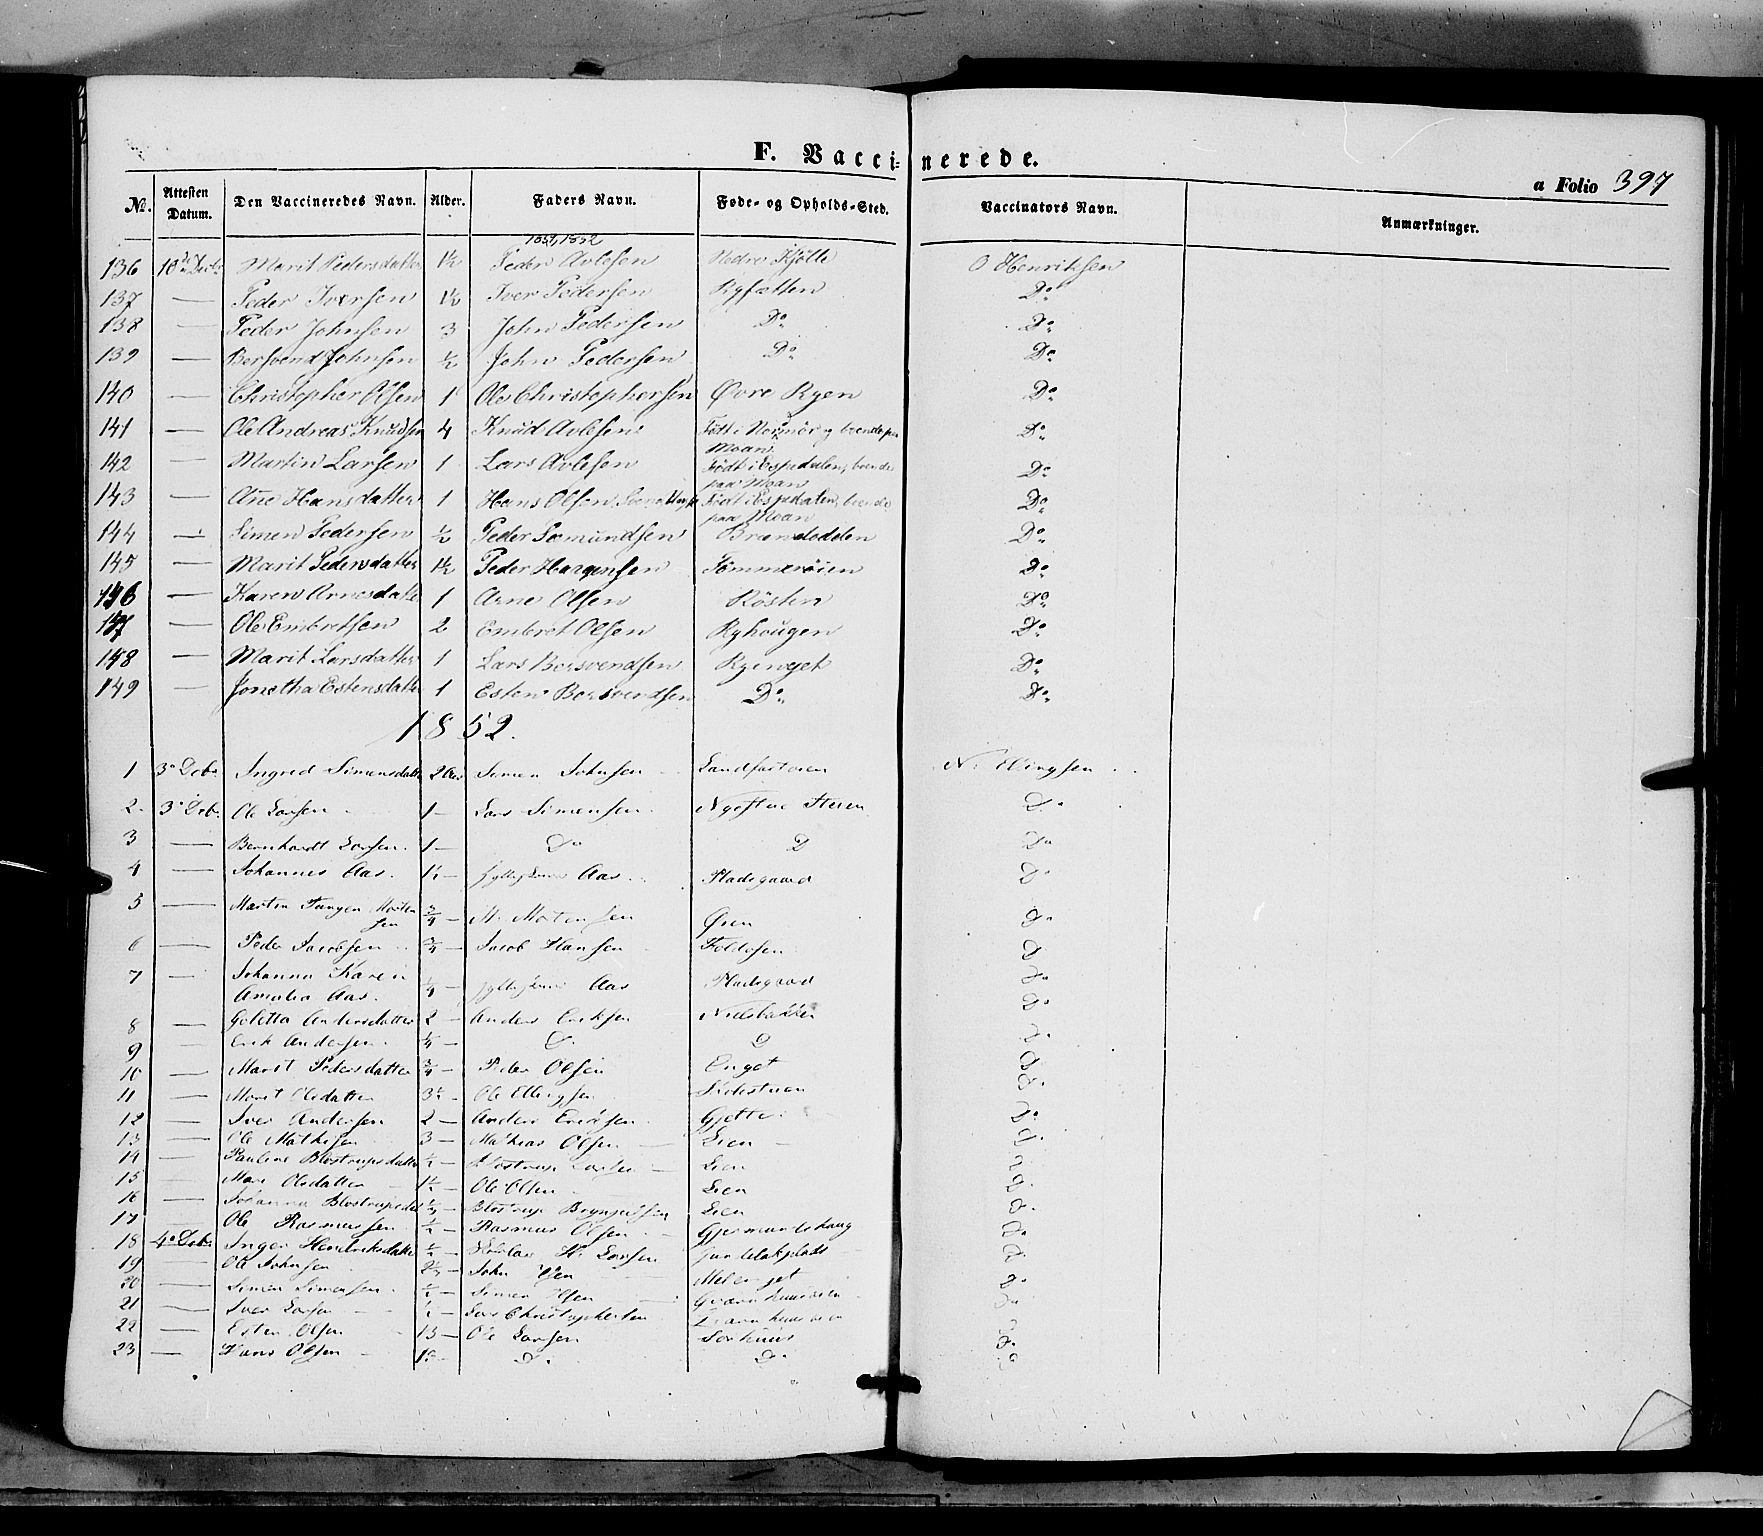 SAH, Tynset prestekontor, Ministerialbok nr. 20, 1848-1862, s. 397